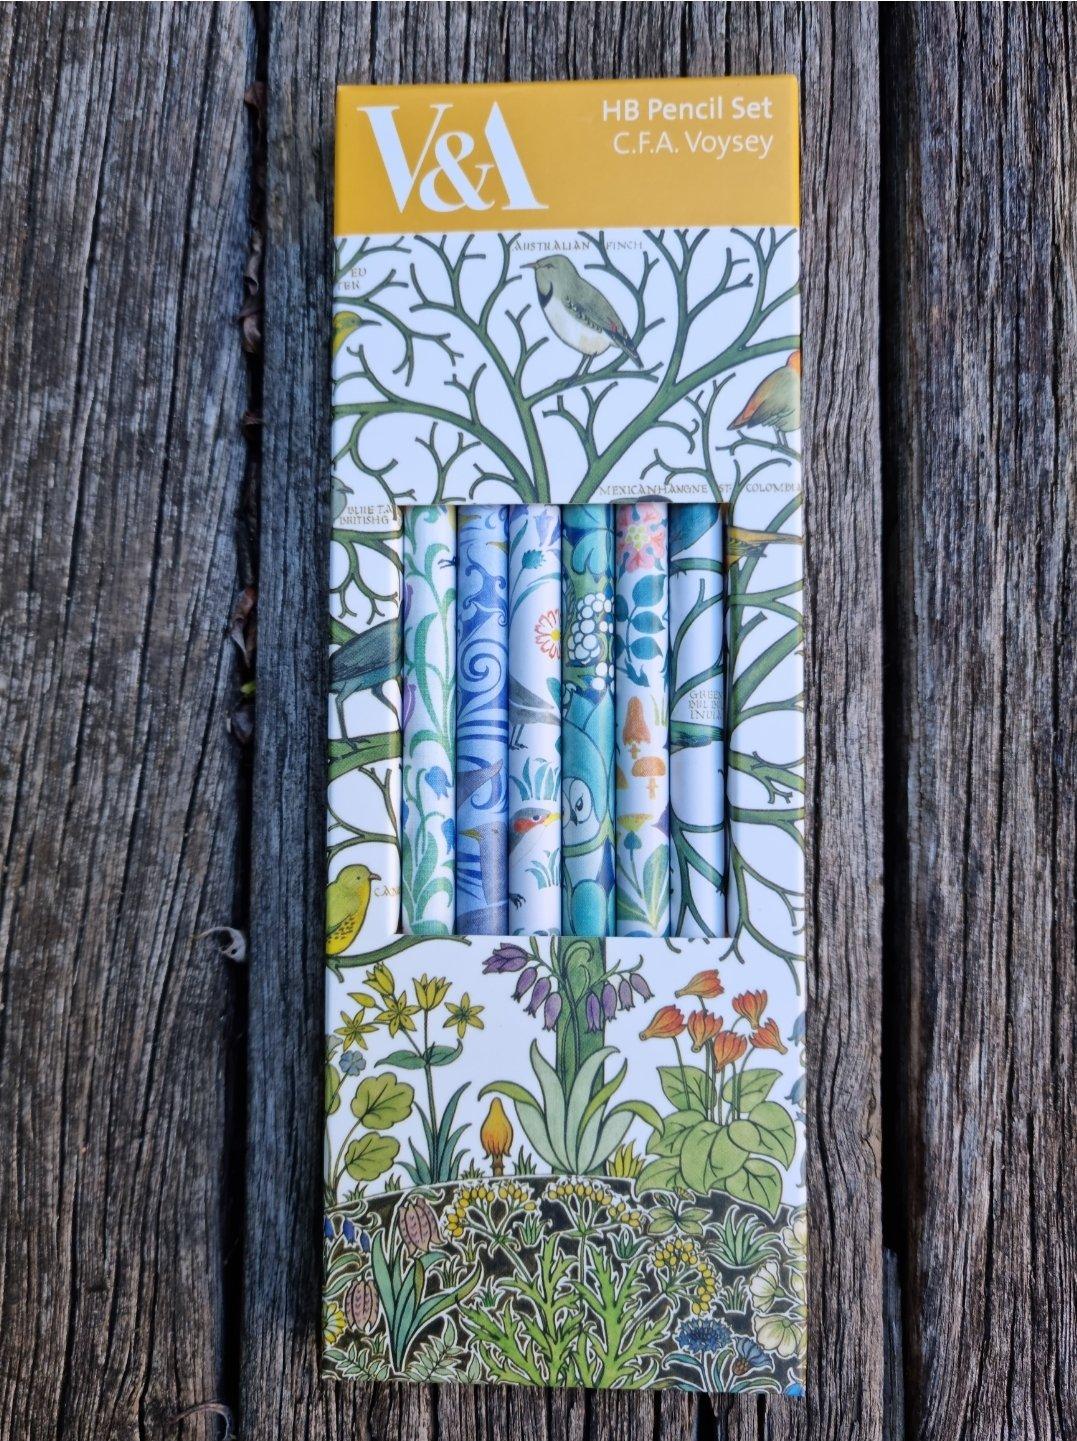 Image of Box of Pencils - CFA Voysey